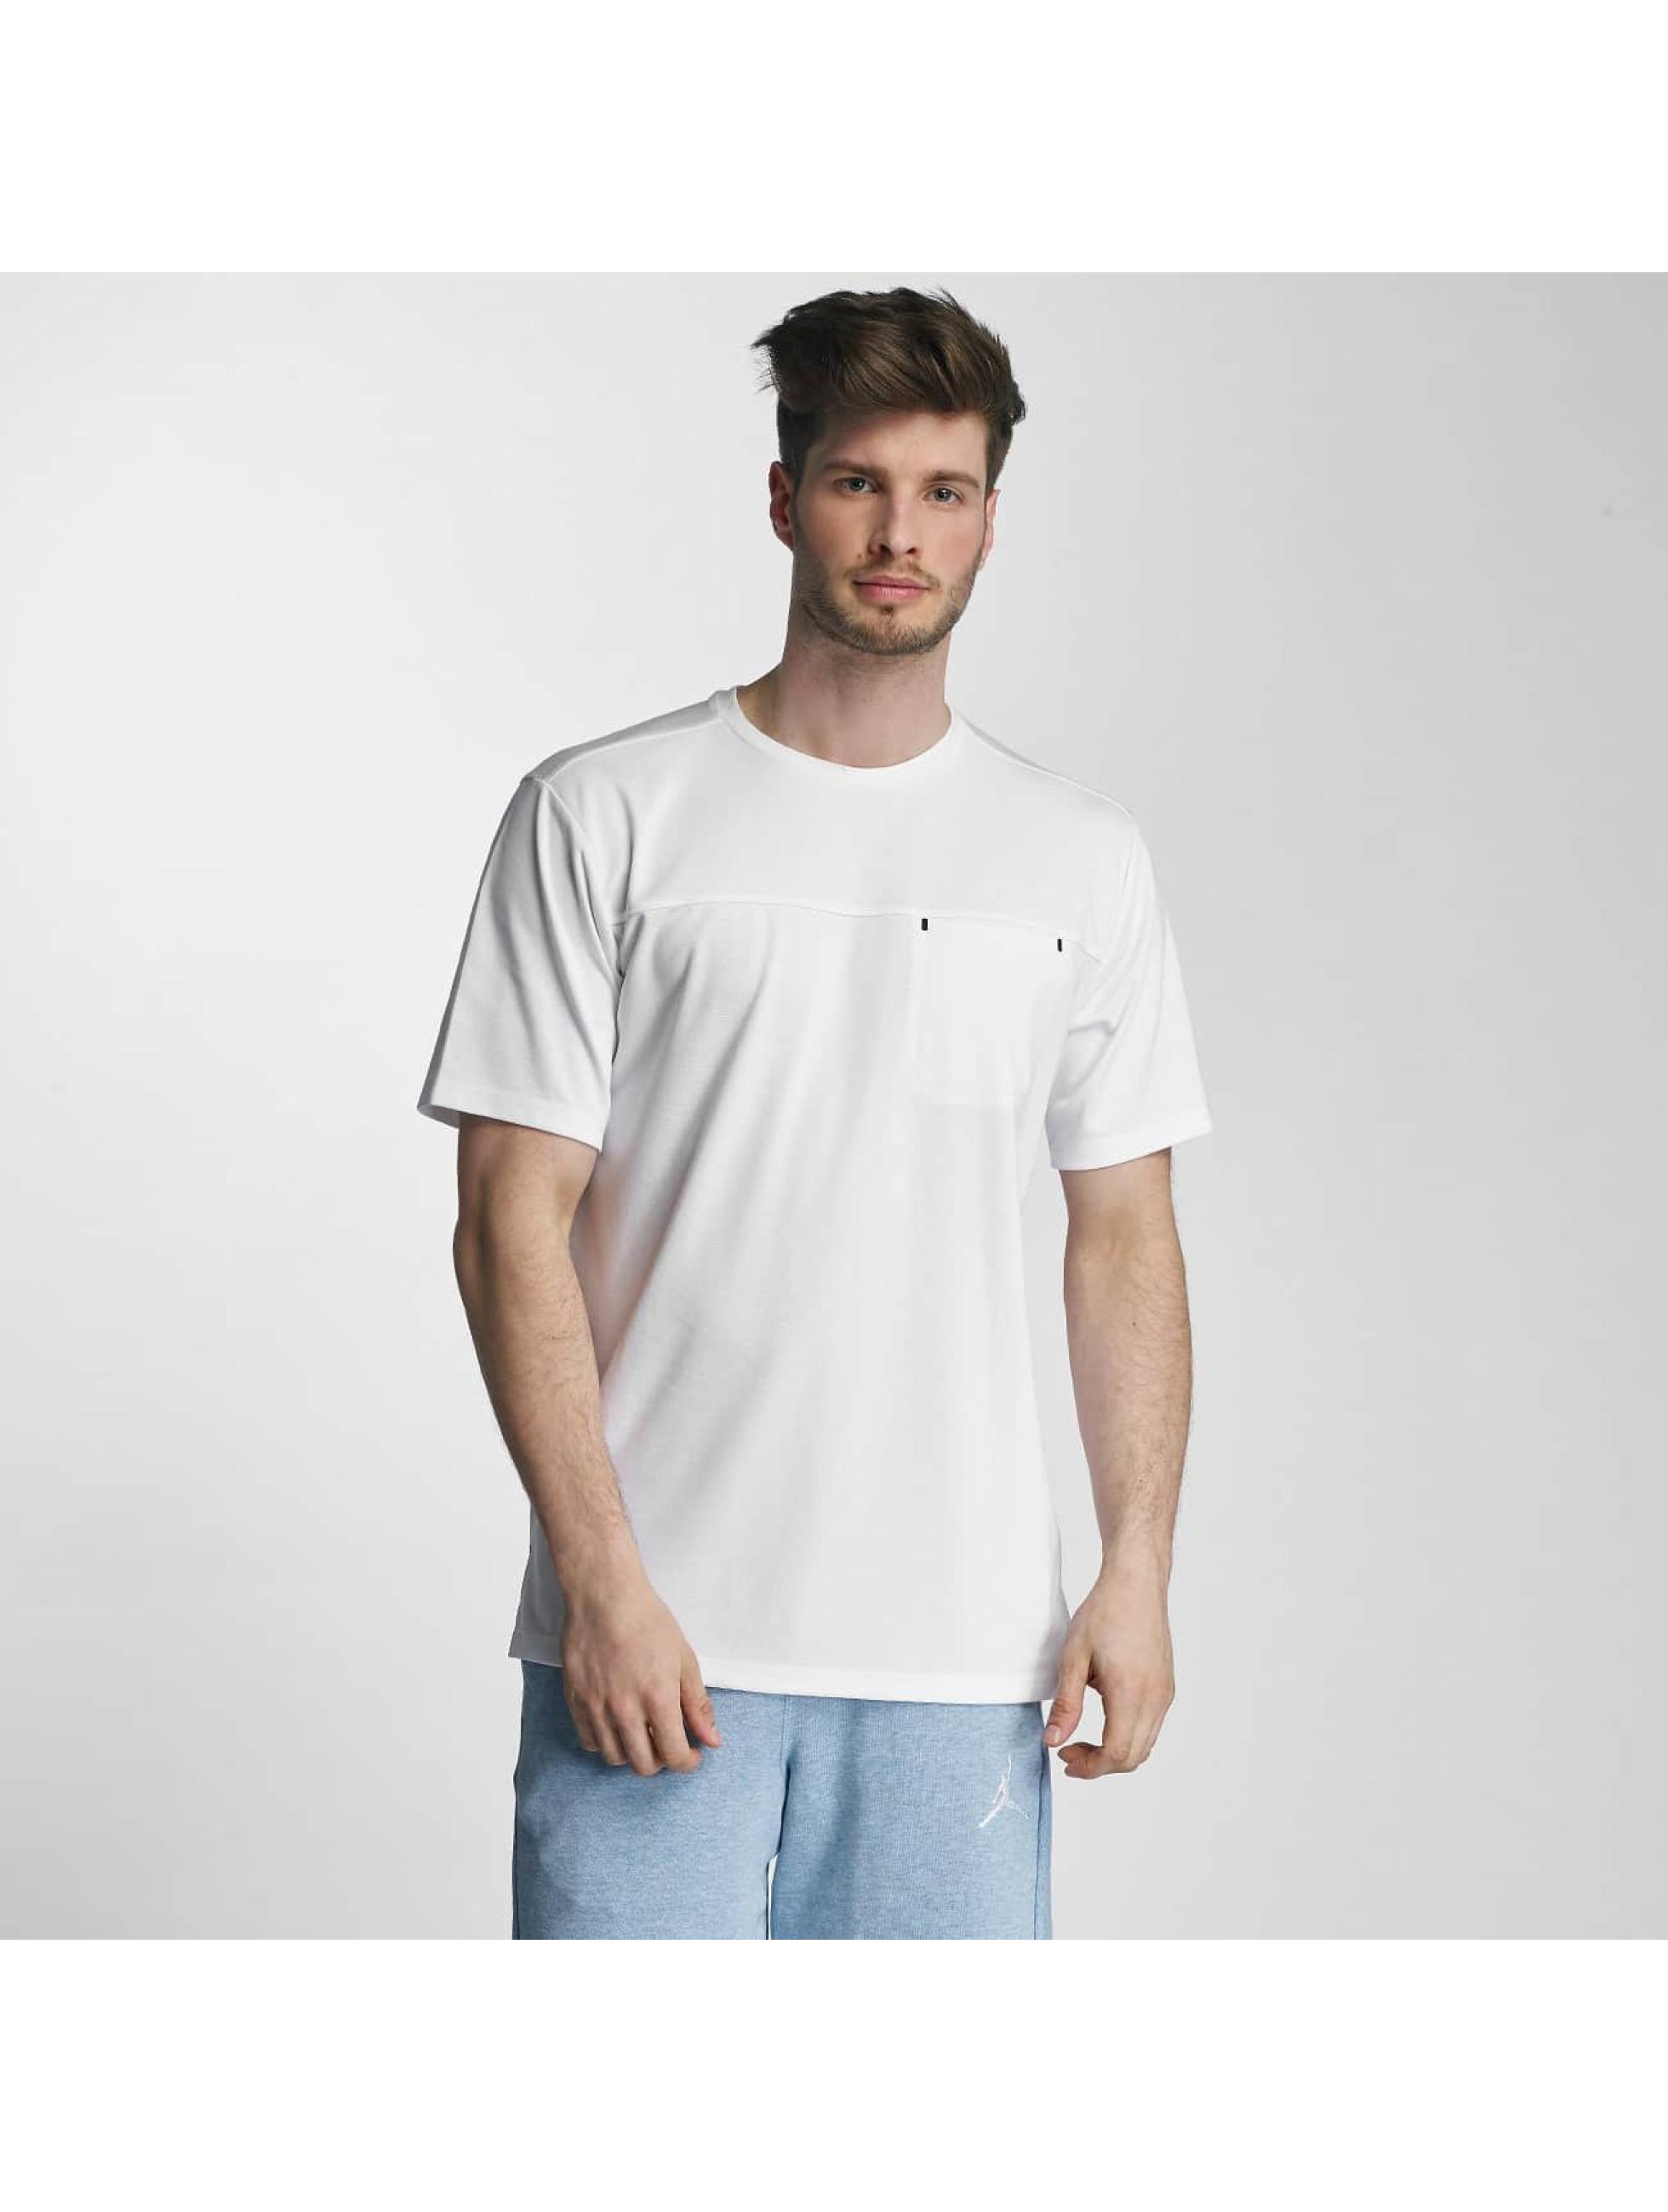 Jordan Männer T-Shirt 23 Lux Classic Pocket in weiß